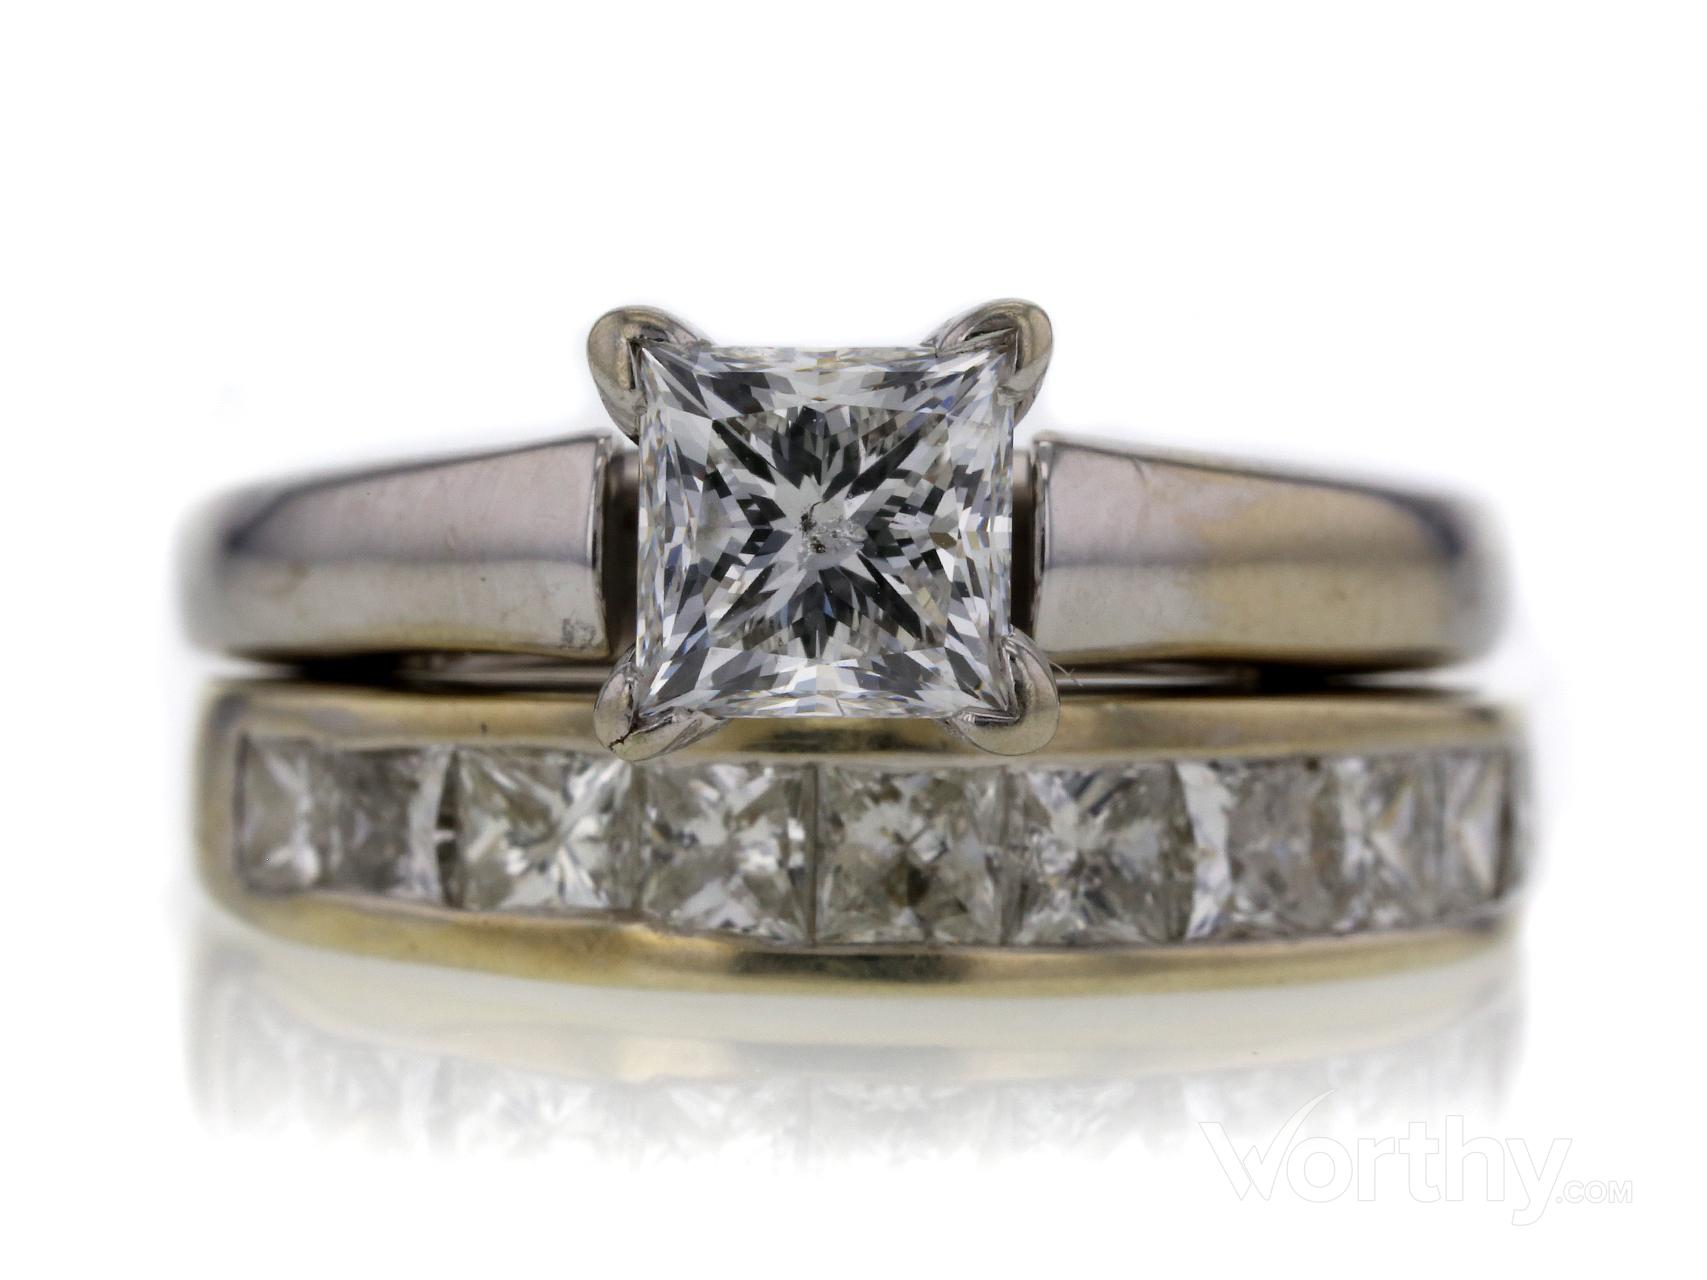 Sell Your Diamond in Yuma Arizona United States 0 99 carat sold